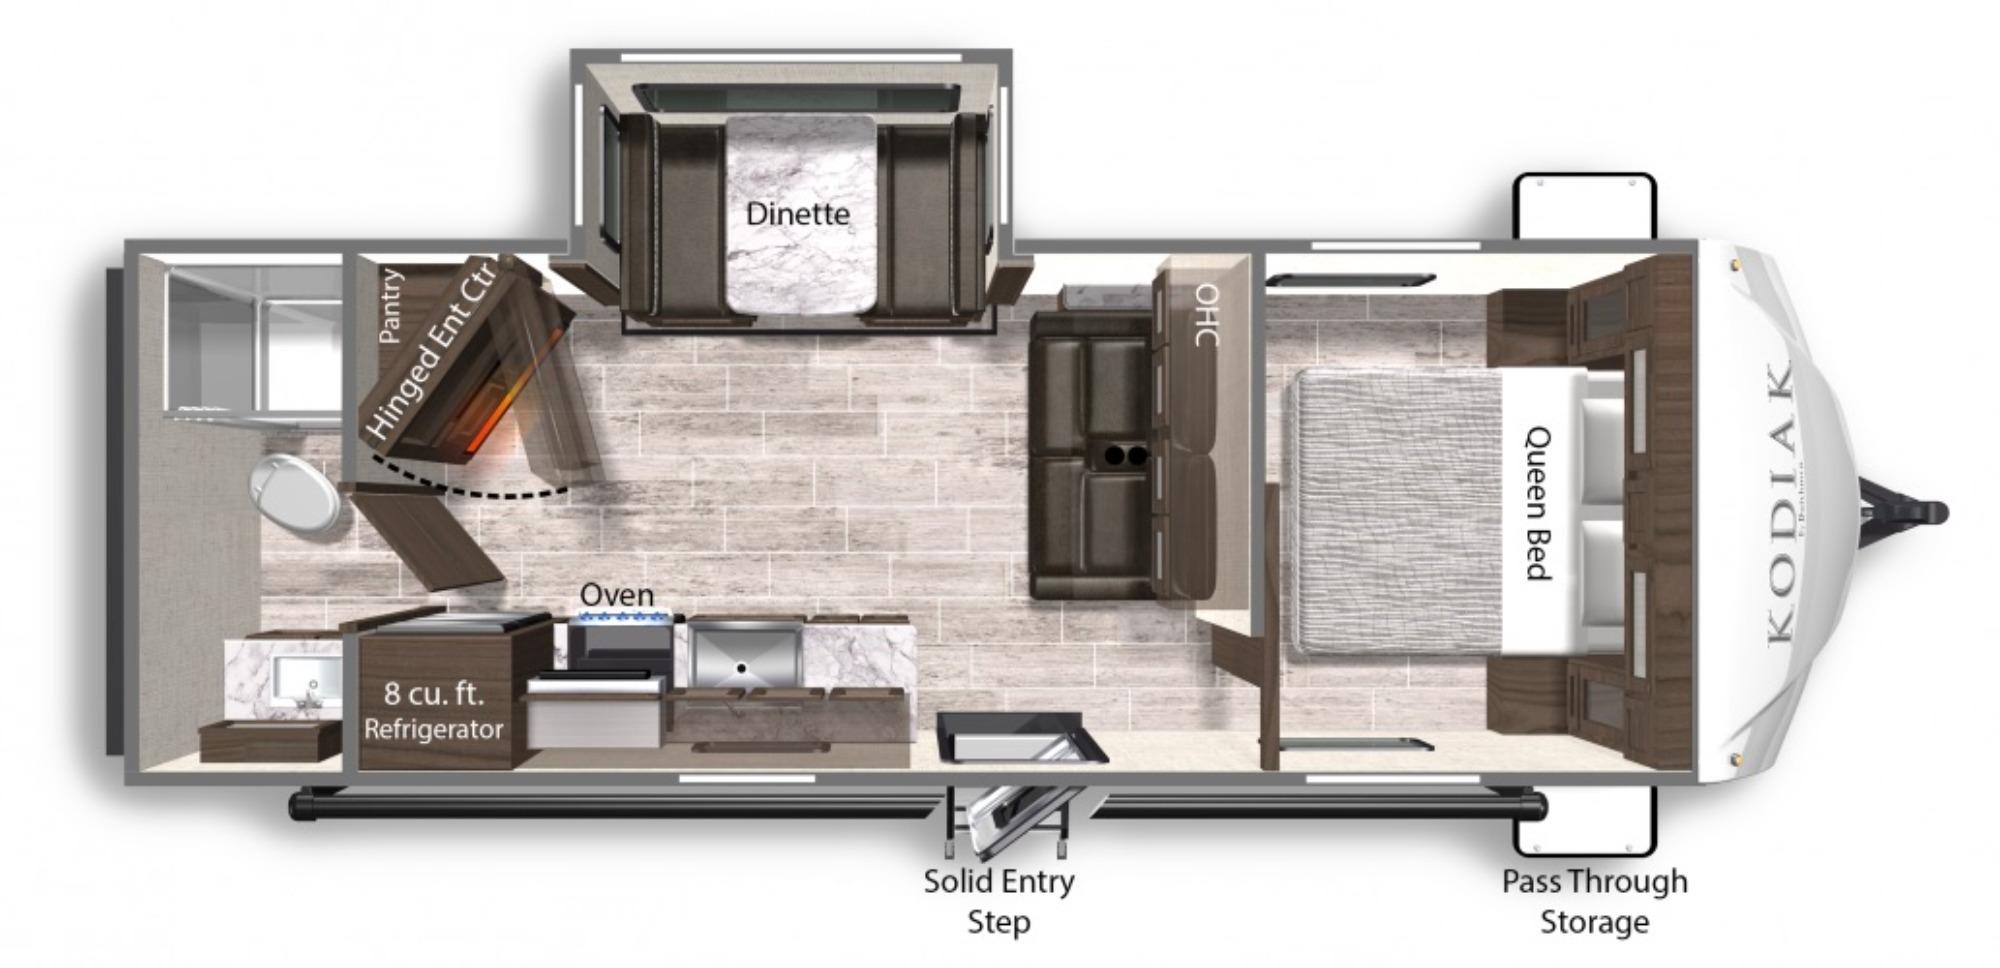 View Floor Plan for 2021 DUTCHMEN KODIAK 242RBSL